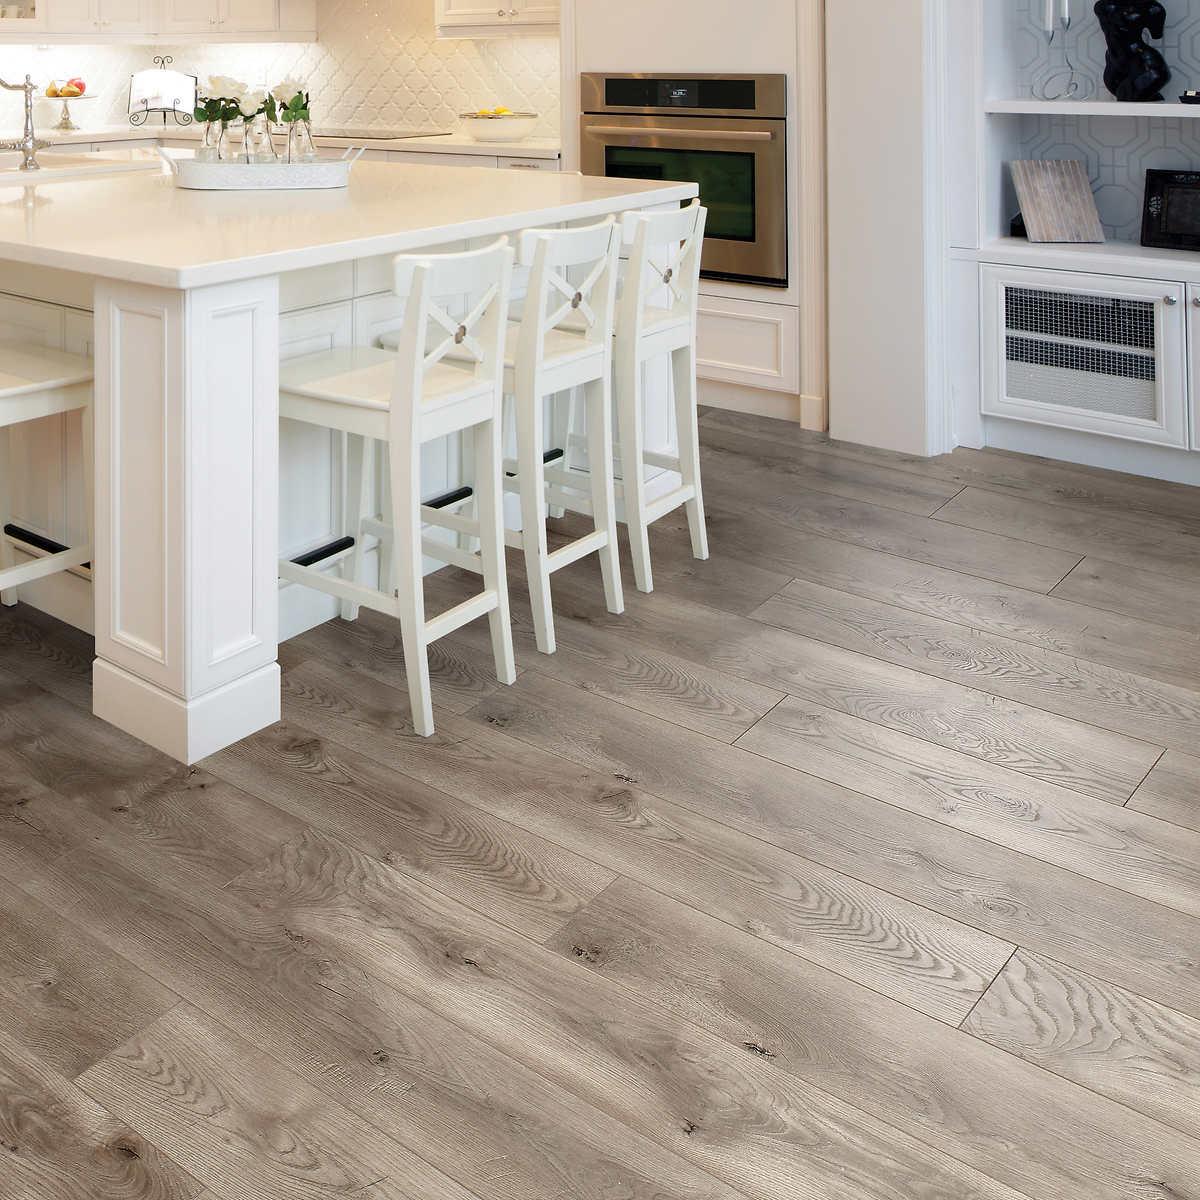 Golden Select Silverleaf 19 2 Cm 7 56, Waterproof Laminate Flooring Canada